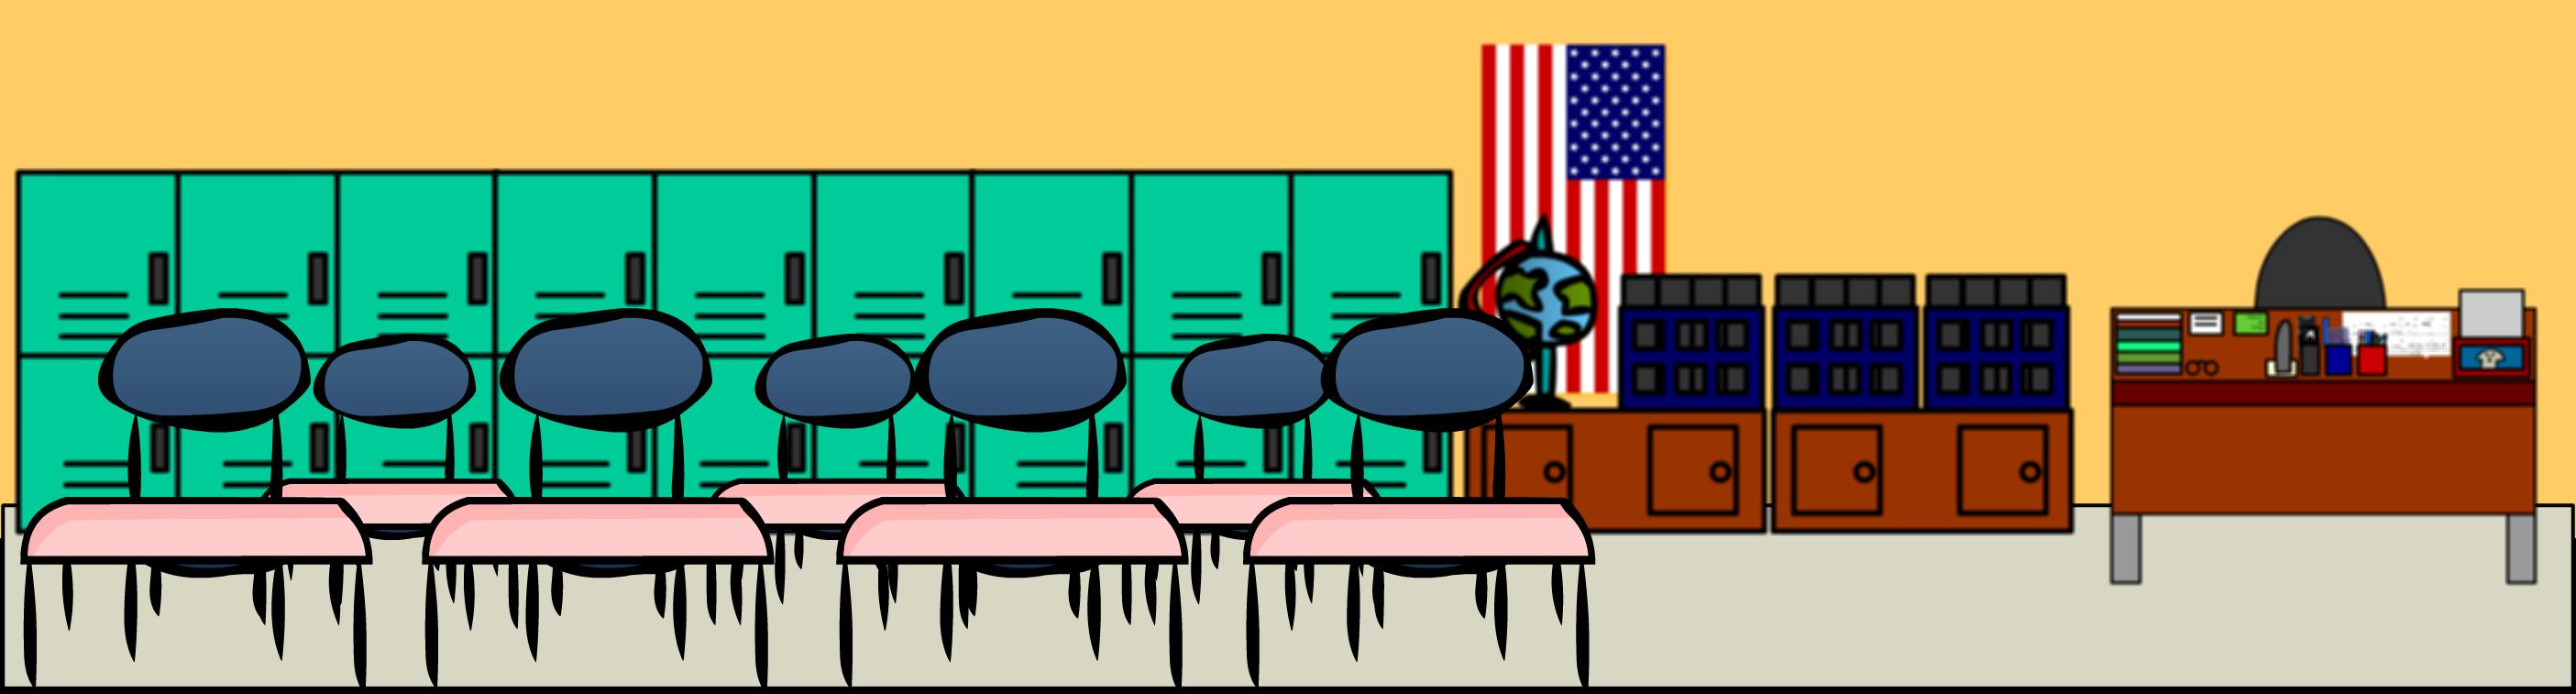 Squishable School Classroom